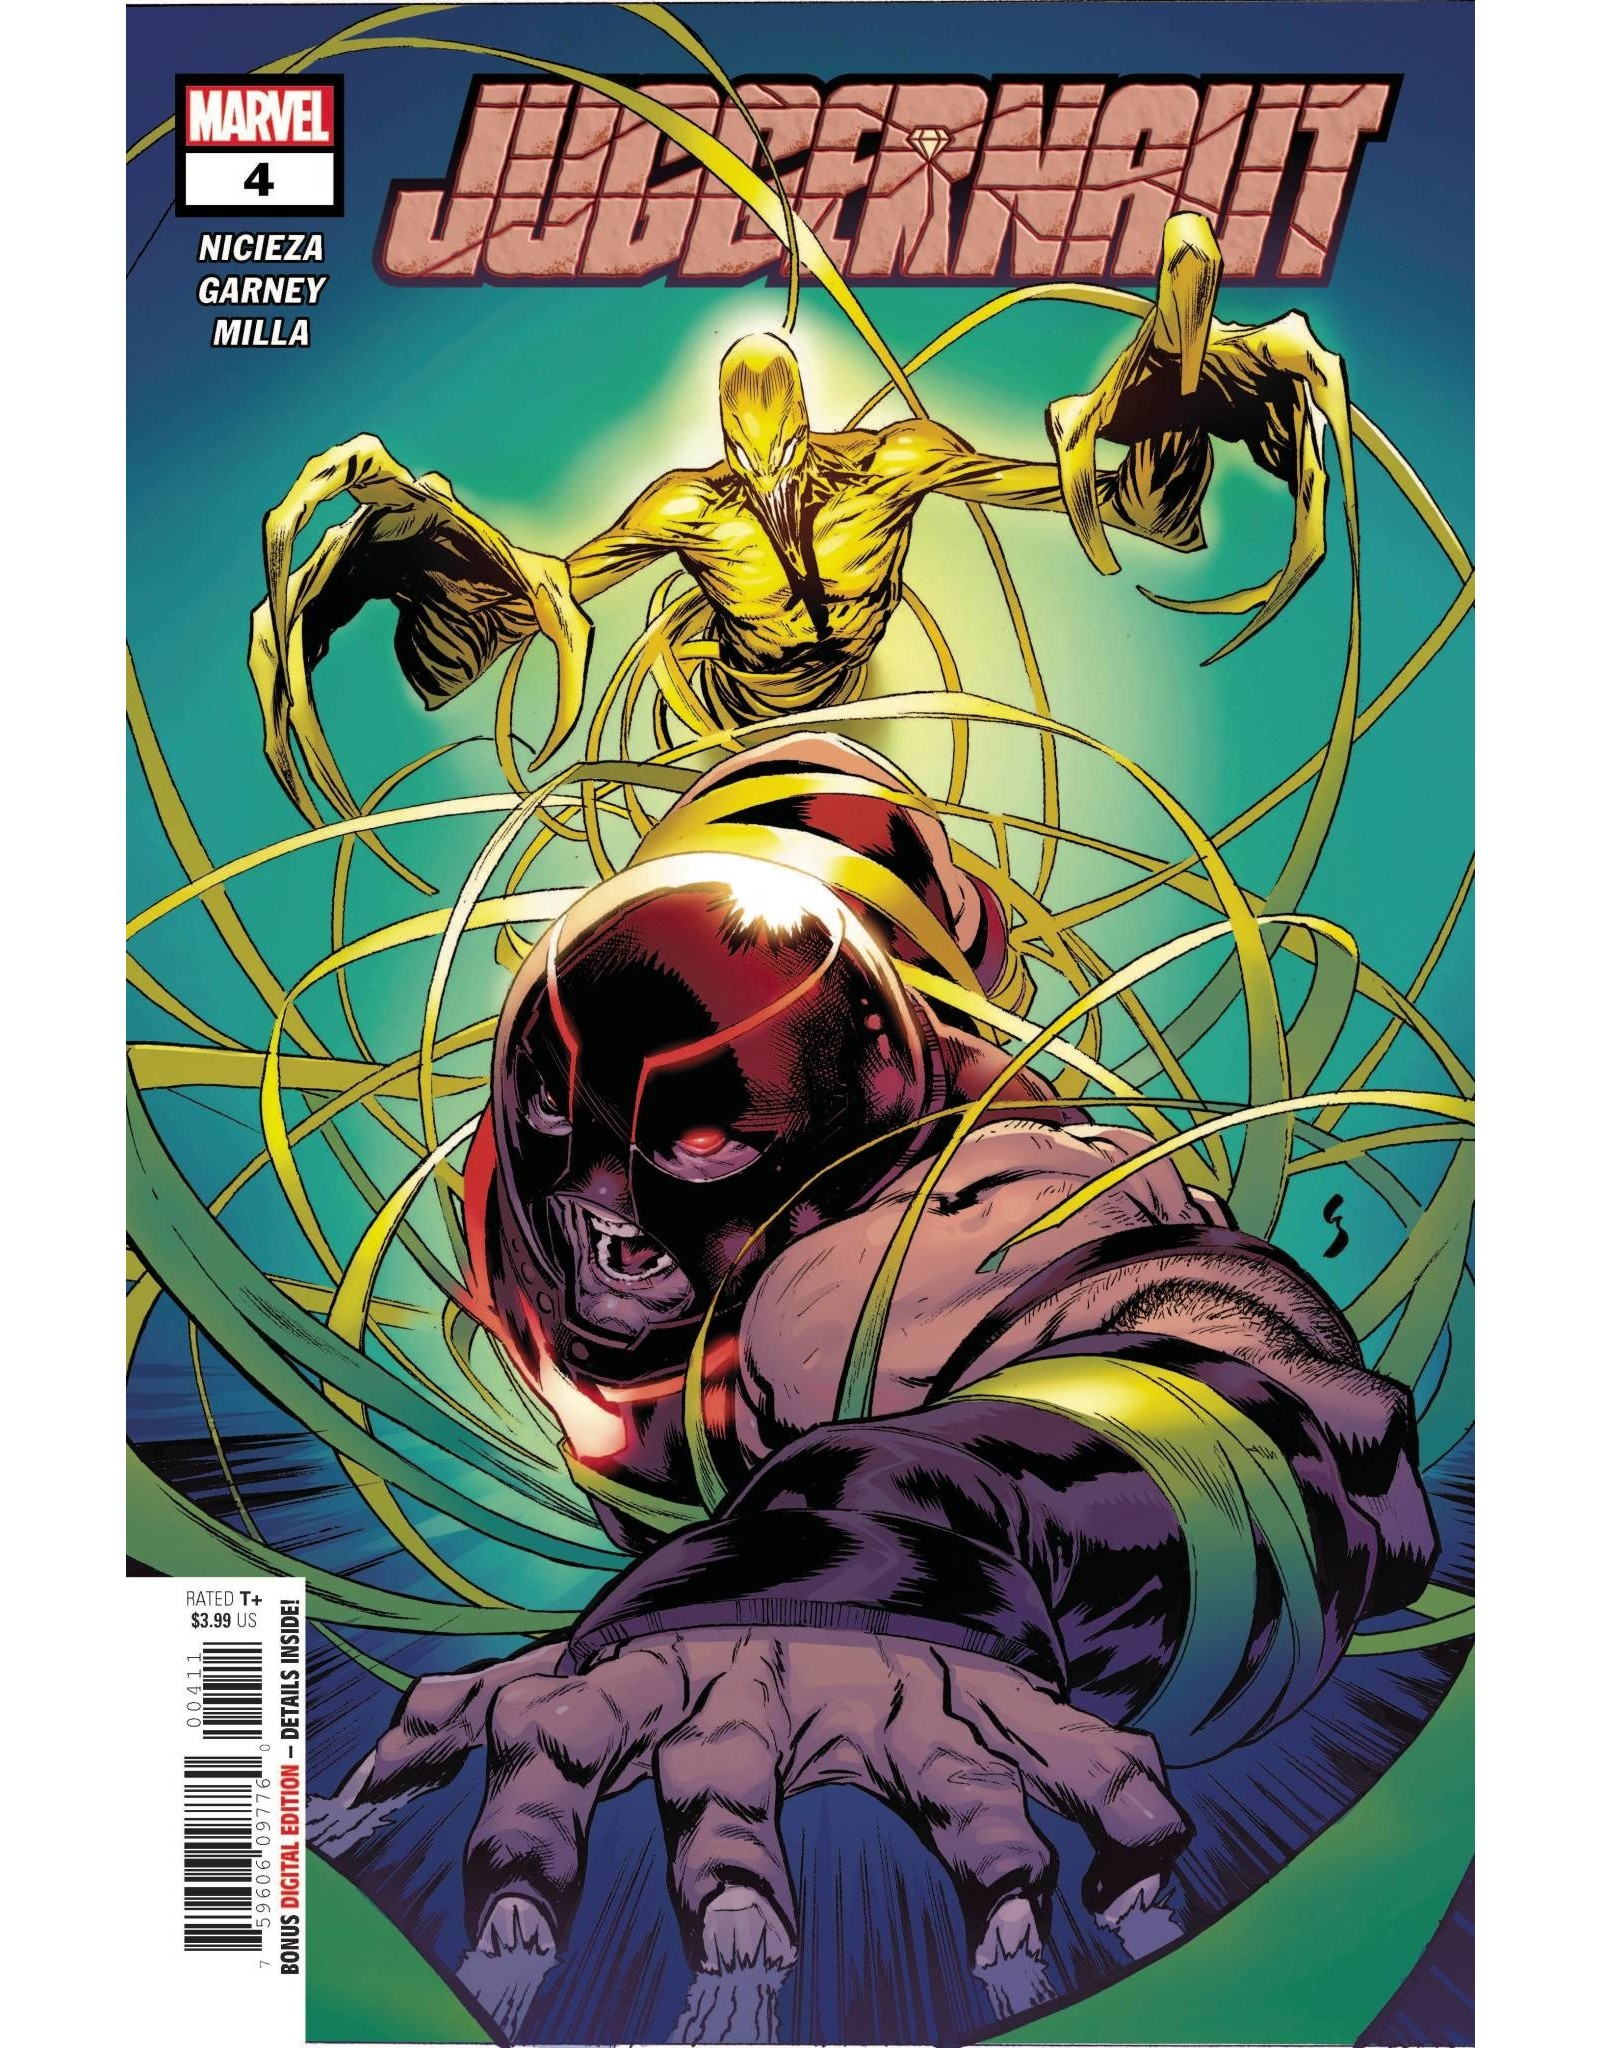 Marvel Comics JUGGERNAUT #4 (OF 5)